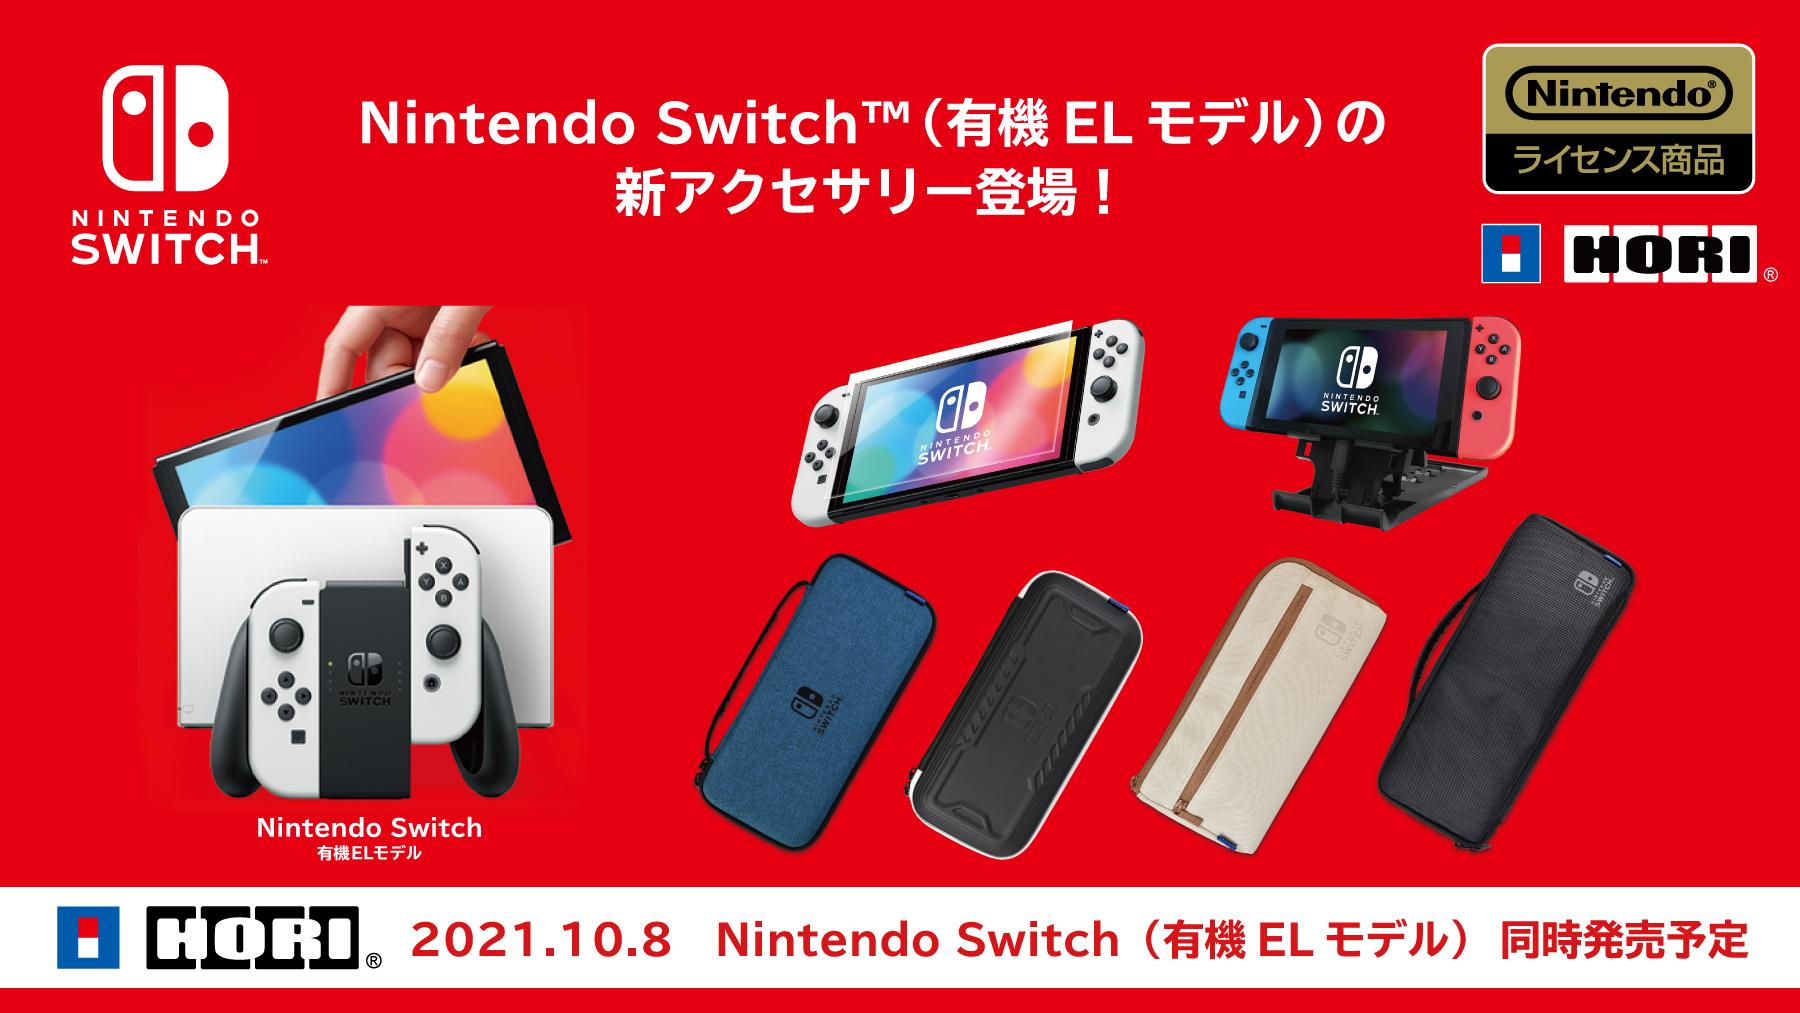 Nintendo Switch (有機ELモデル)対応の周辺機器・アクセサリー新製品が続々登場!